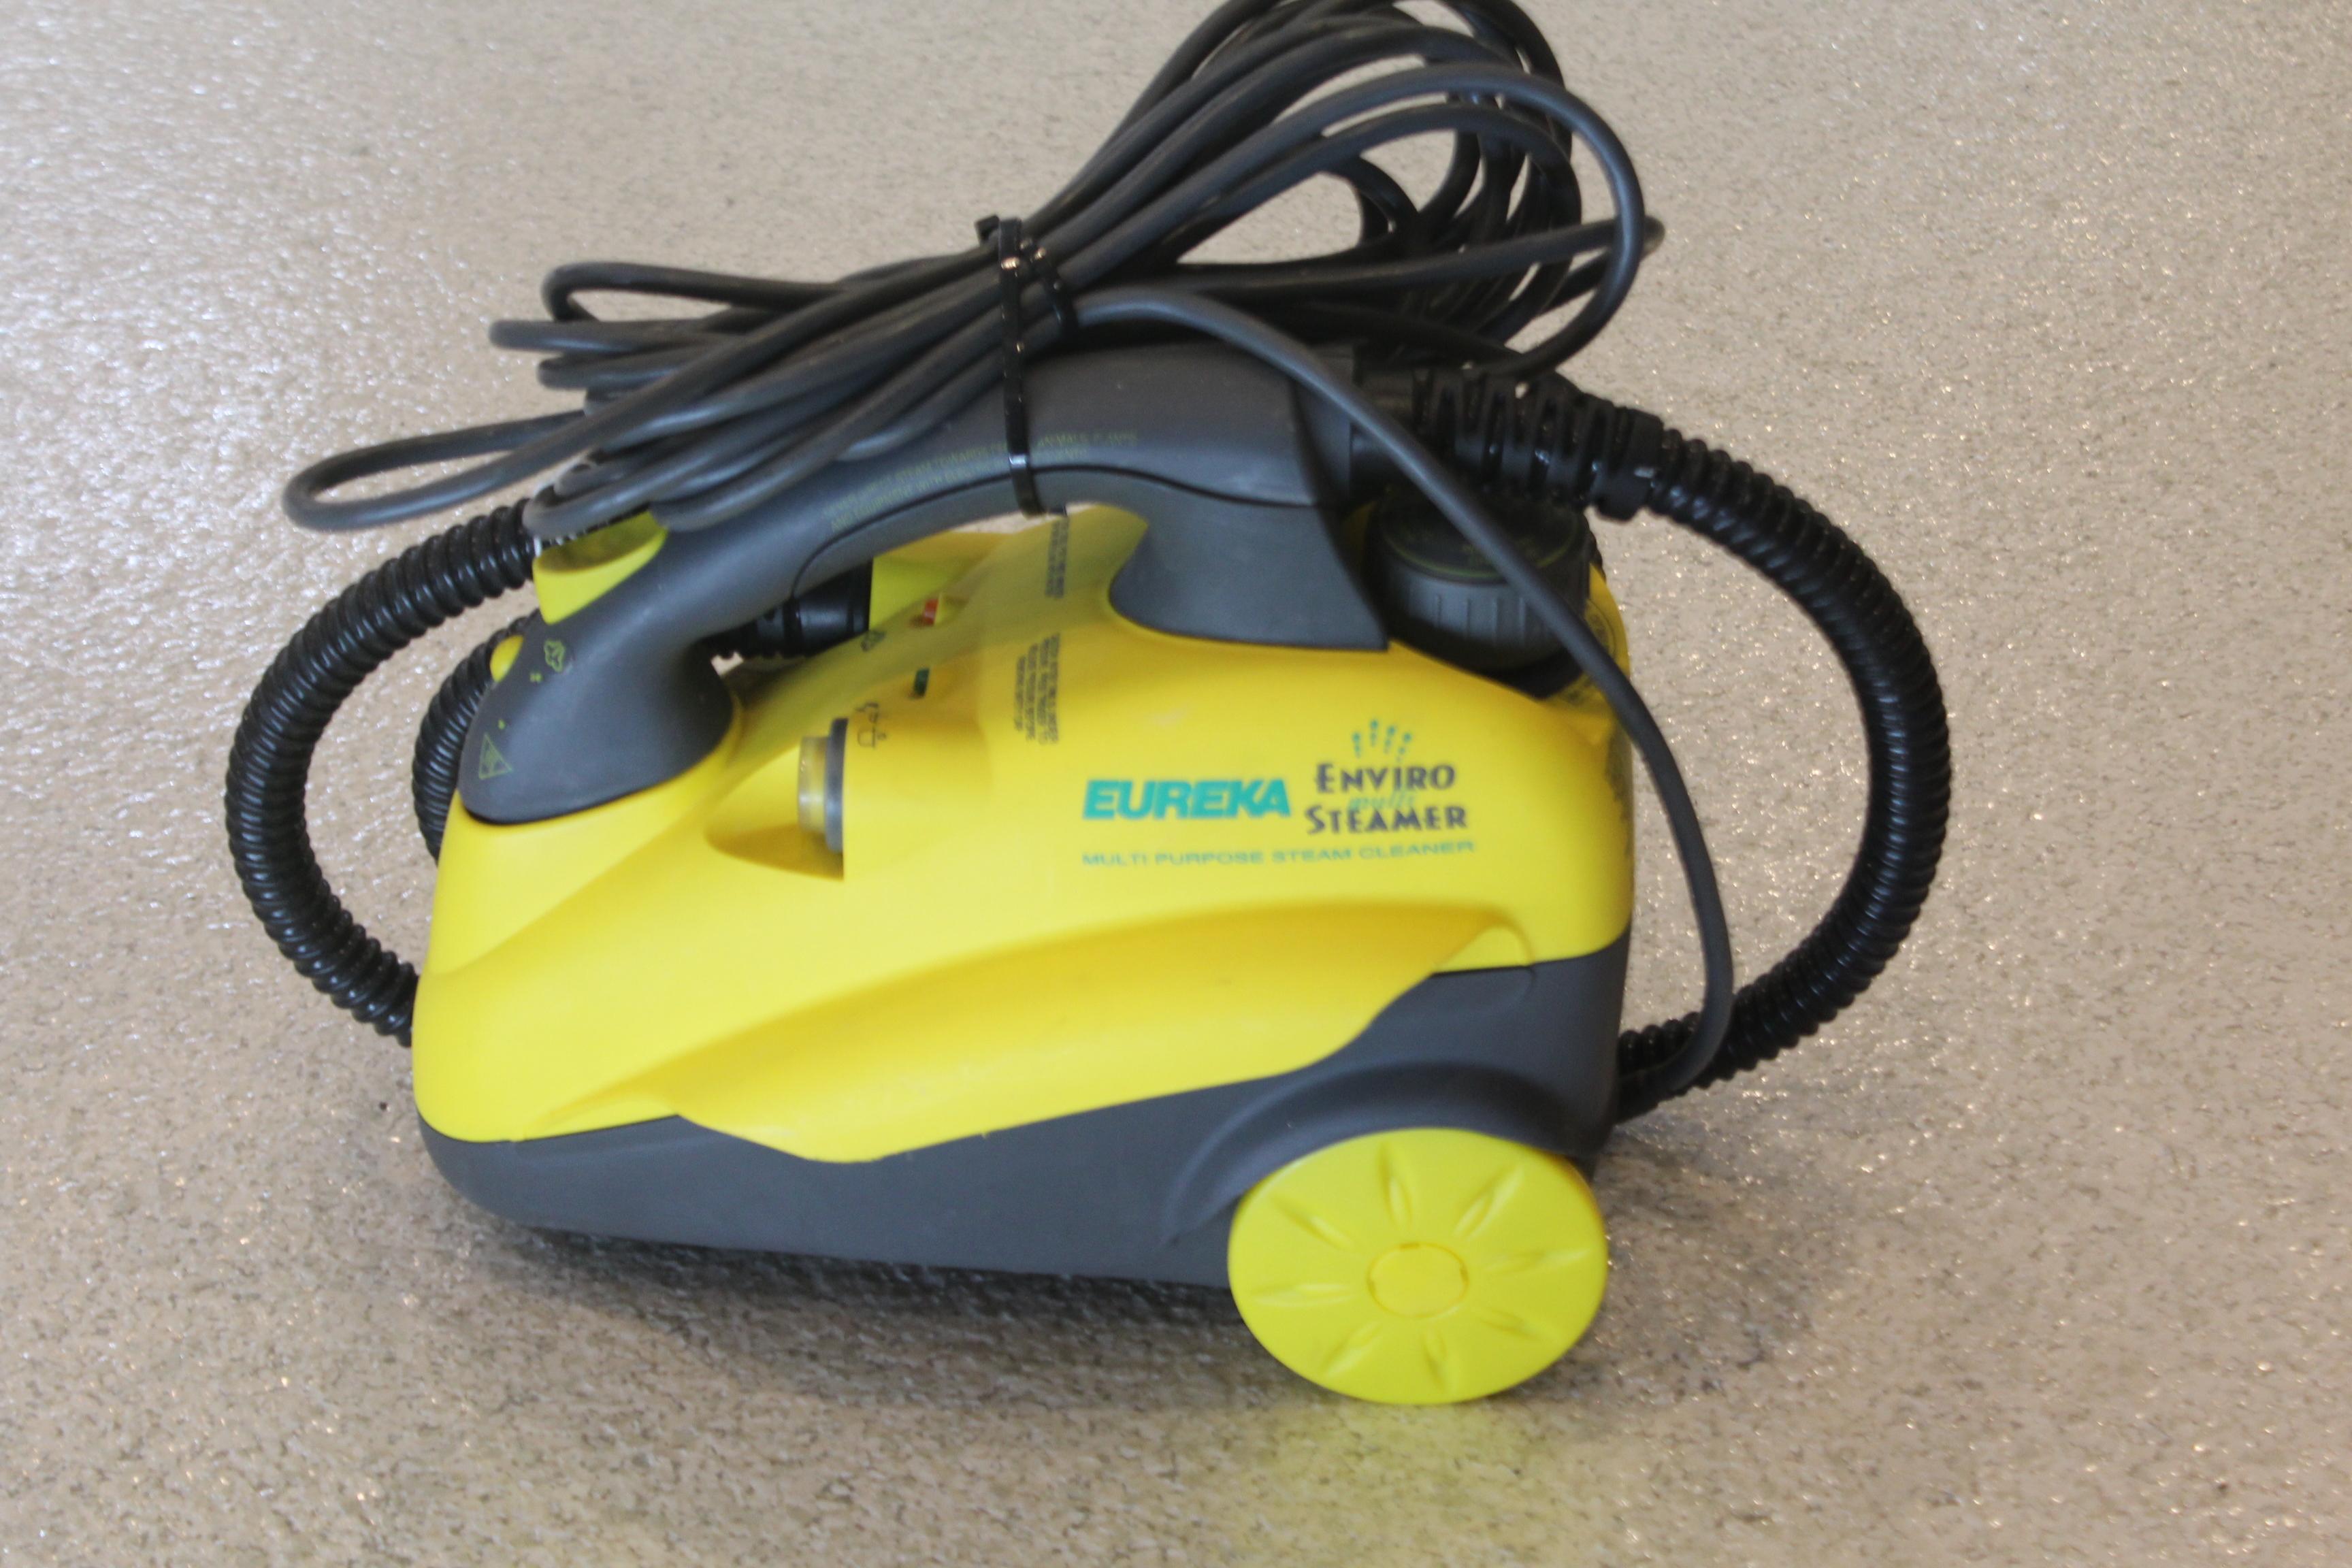 Eureka Multi Purpose Steam Cleaner